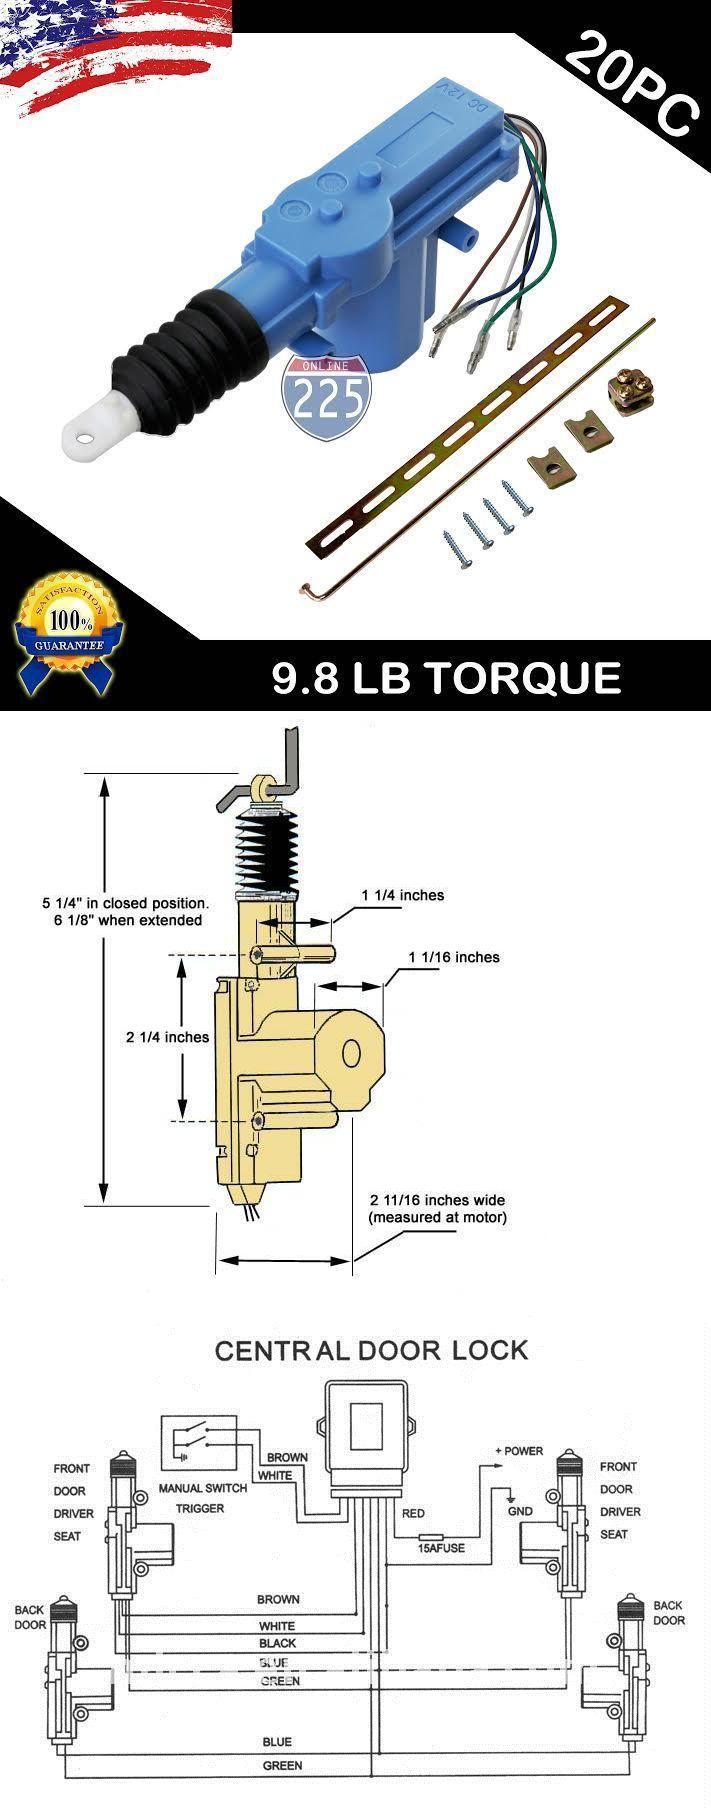 WD_0794] 5 Wire Motor Actuator Diagram Schematic WiringTrofu Simij Tixat Bupi Hyedi Stre Sieg Hendil Mohammedshrine Librar Wiring  101